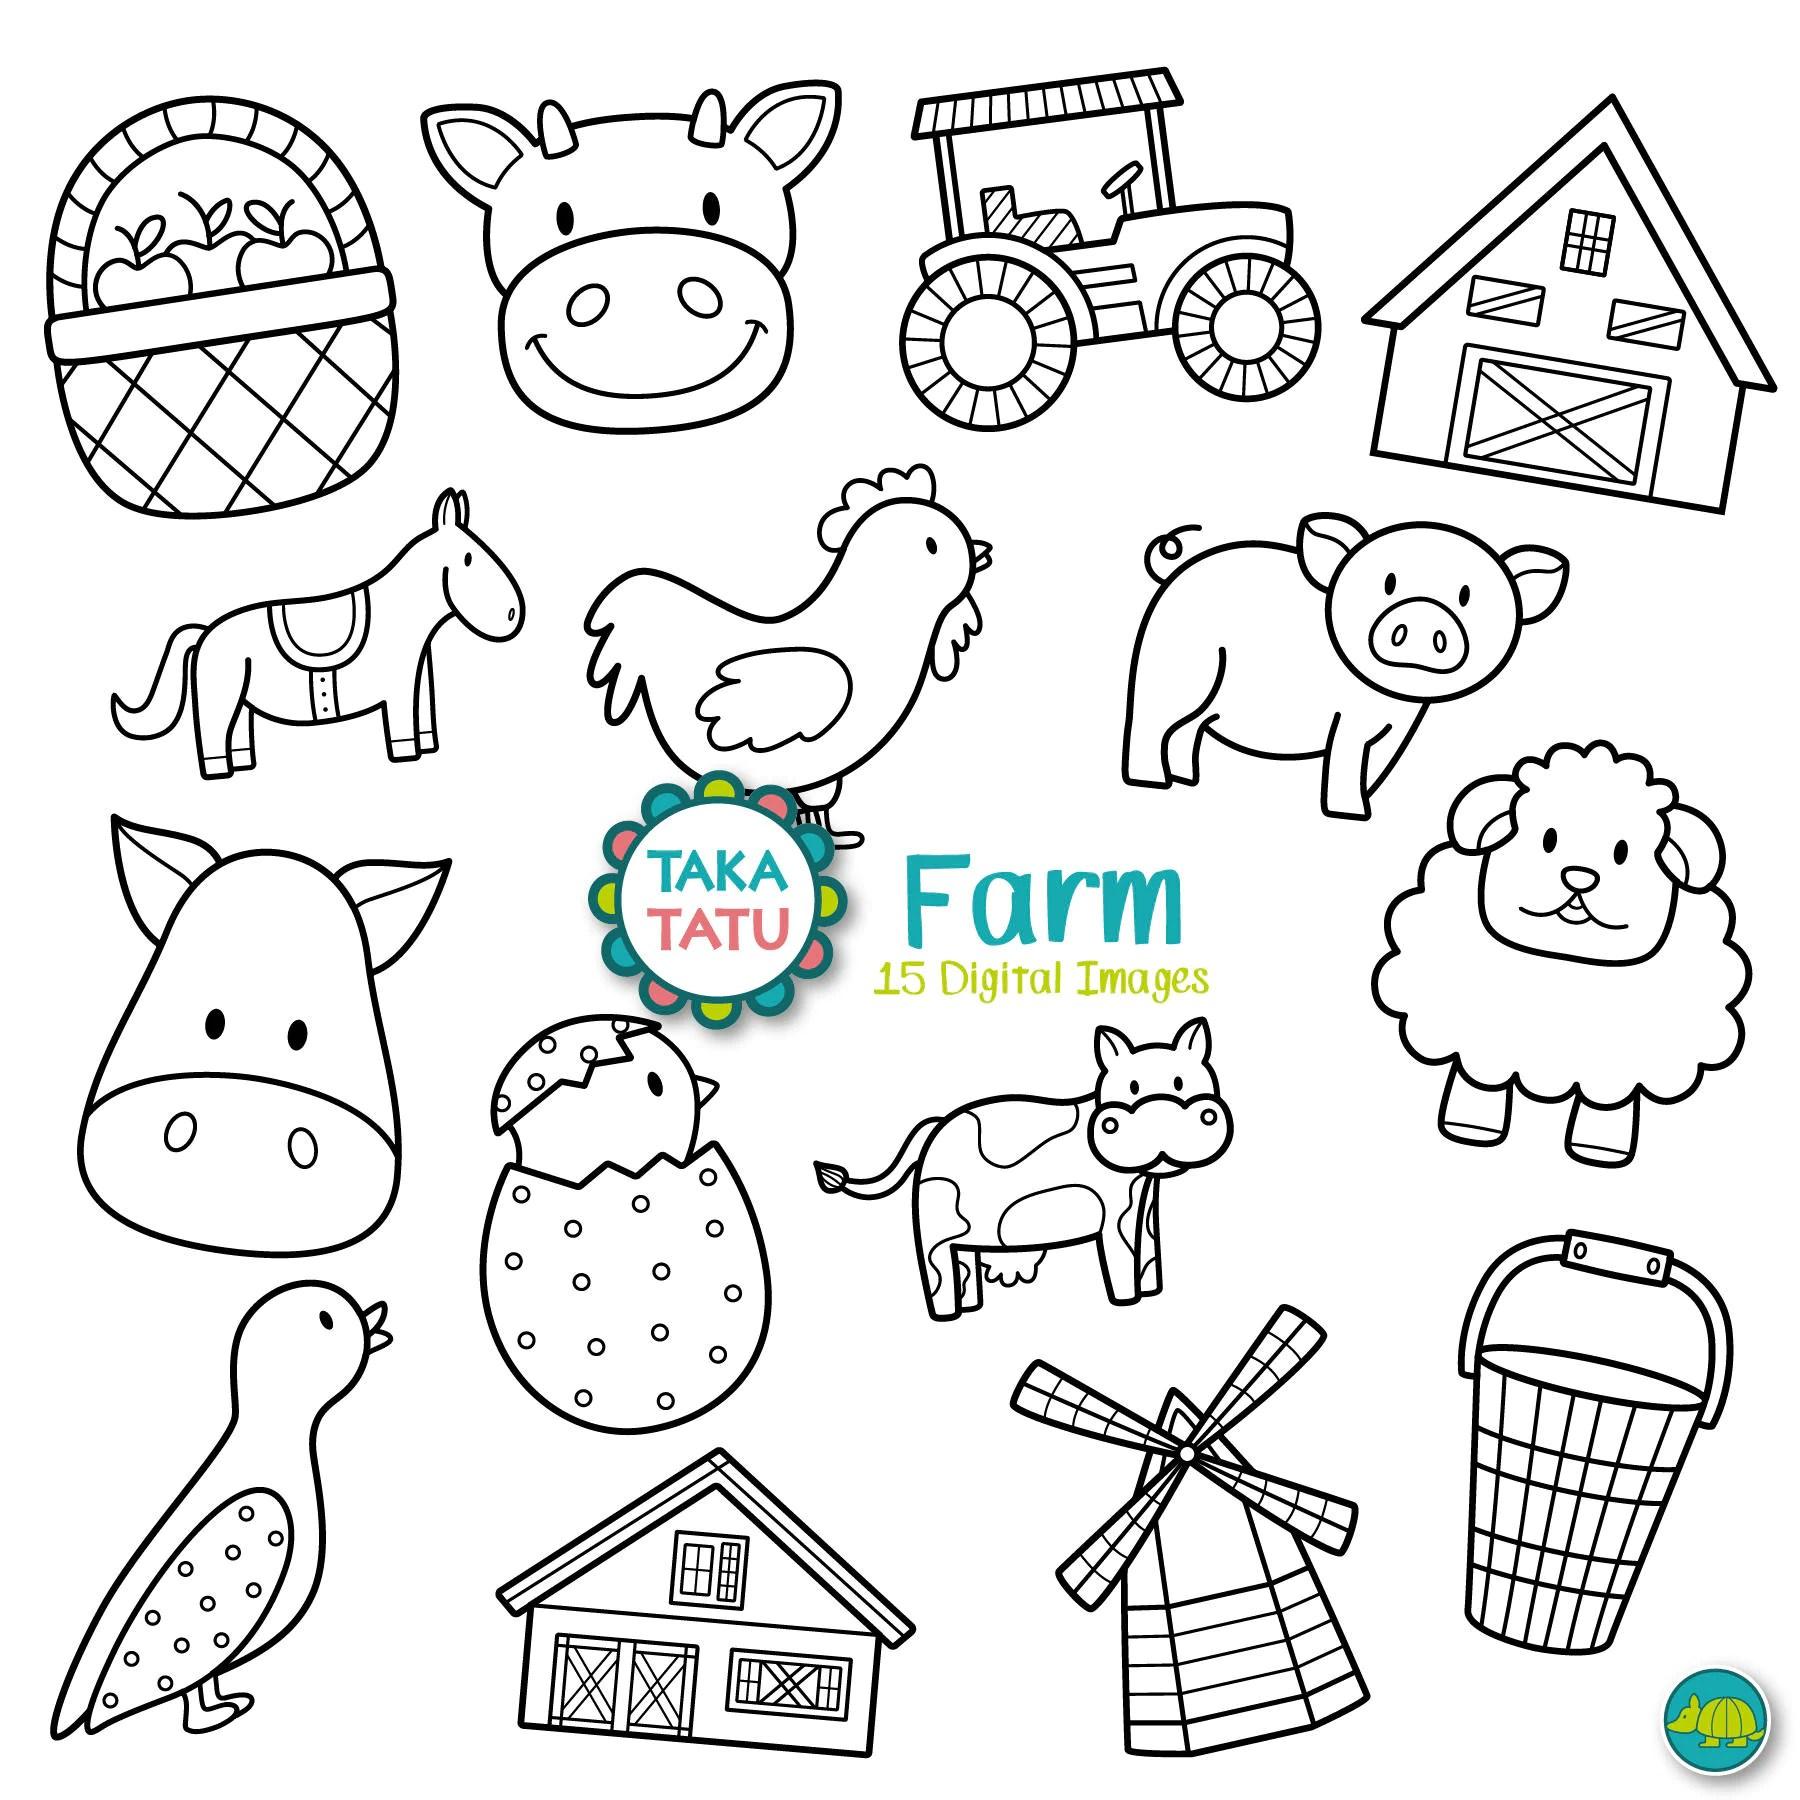 Farm Digital Stamp Farm Clipart Farm Line Art Farm